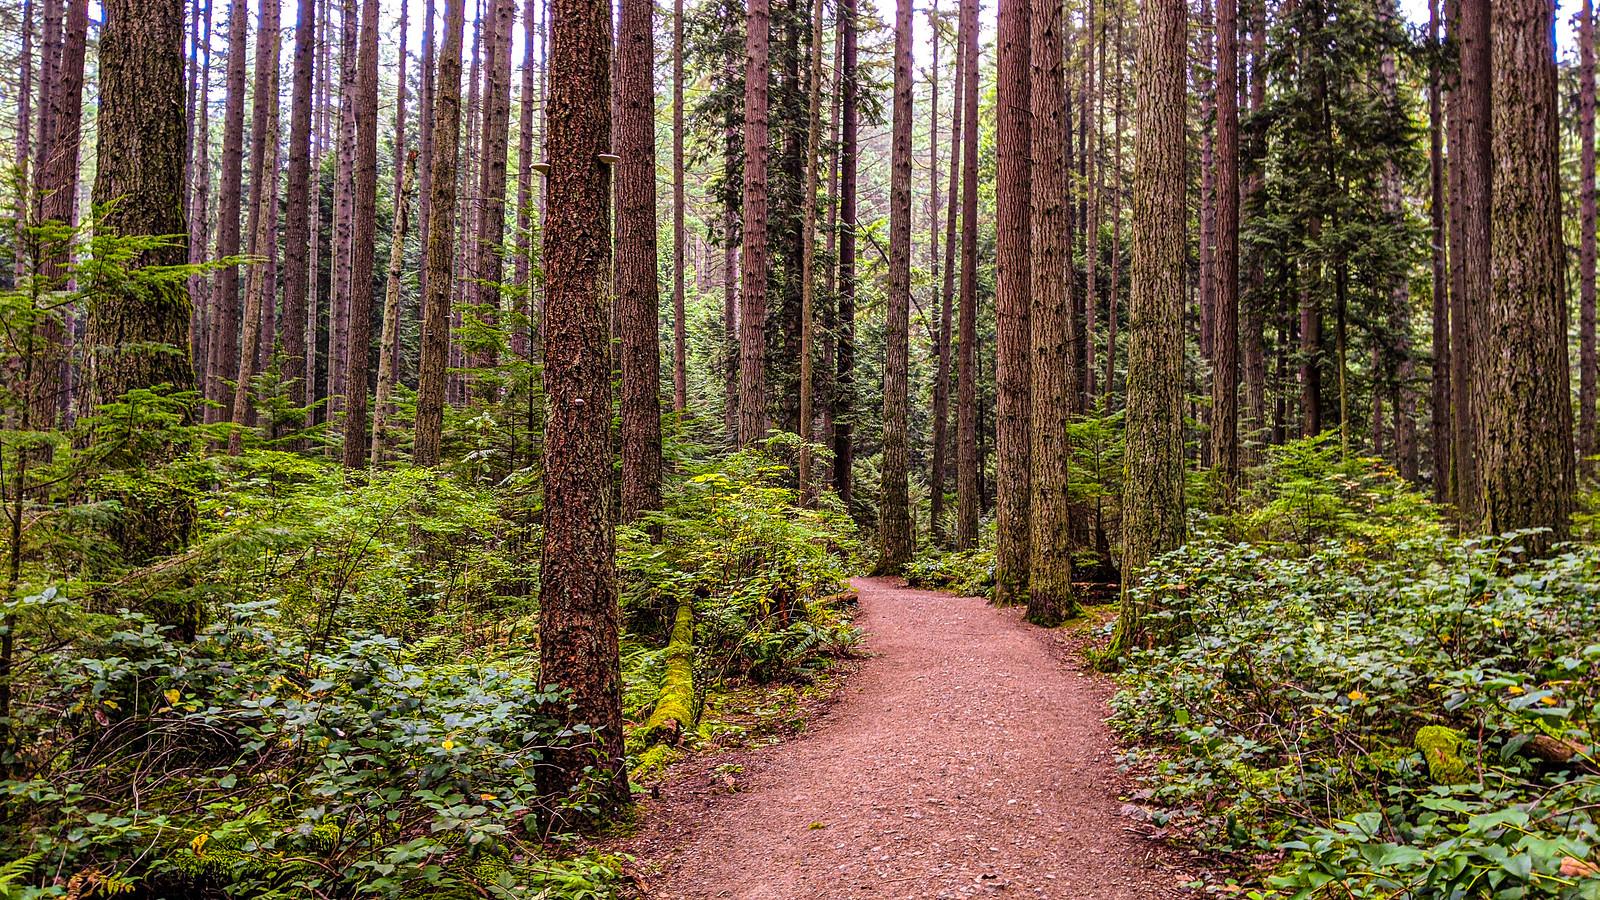 Pacific Spirit Regional Park at 2900km